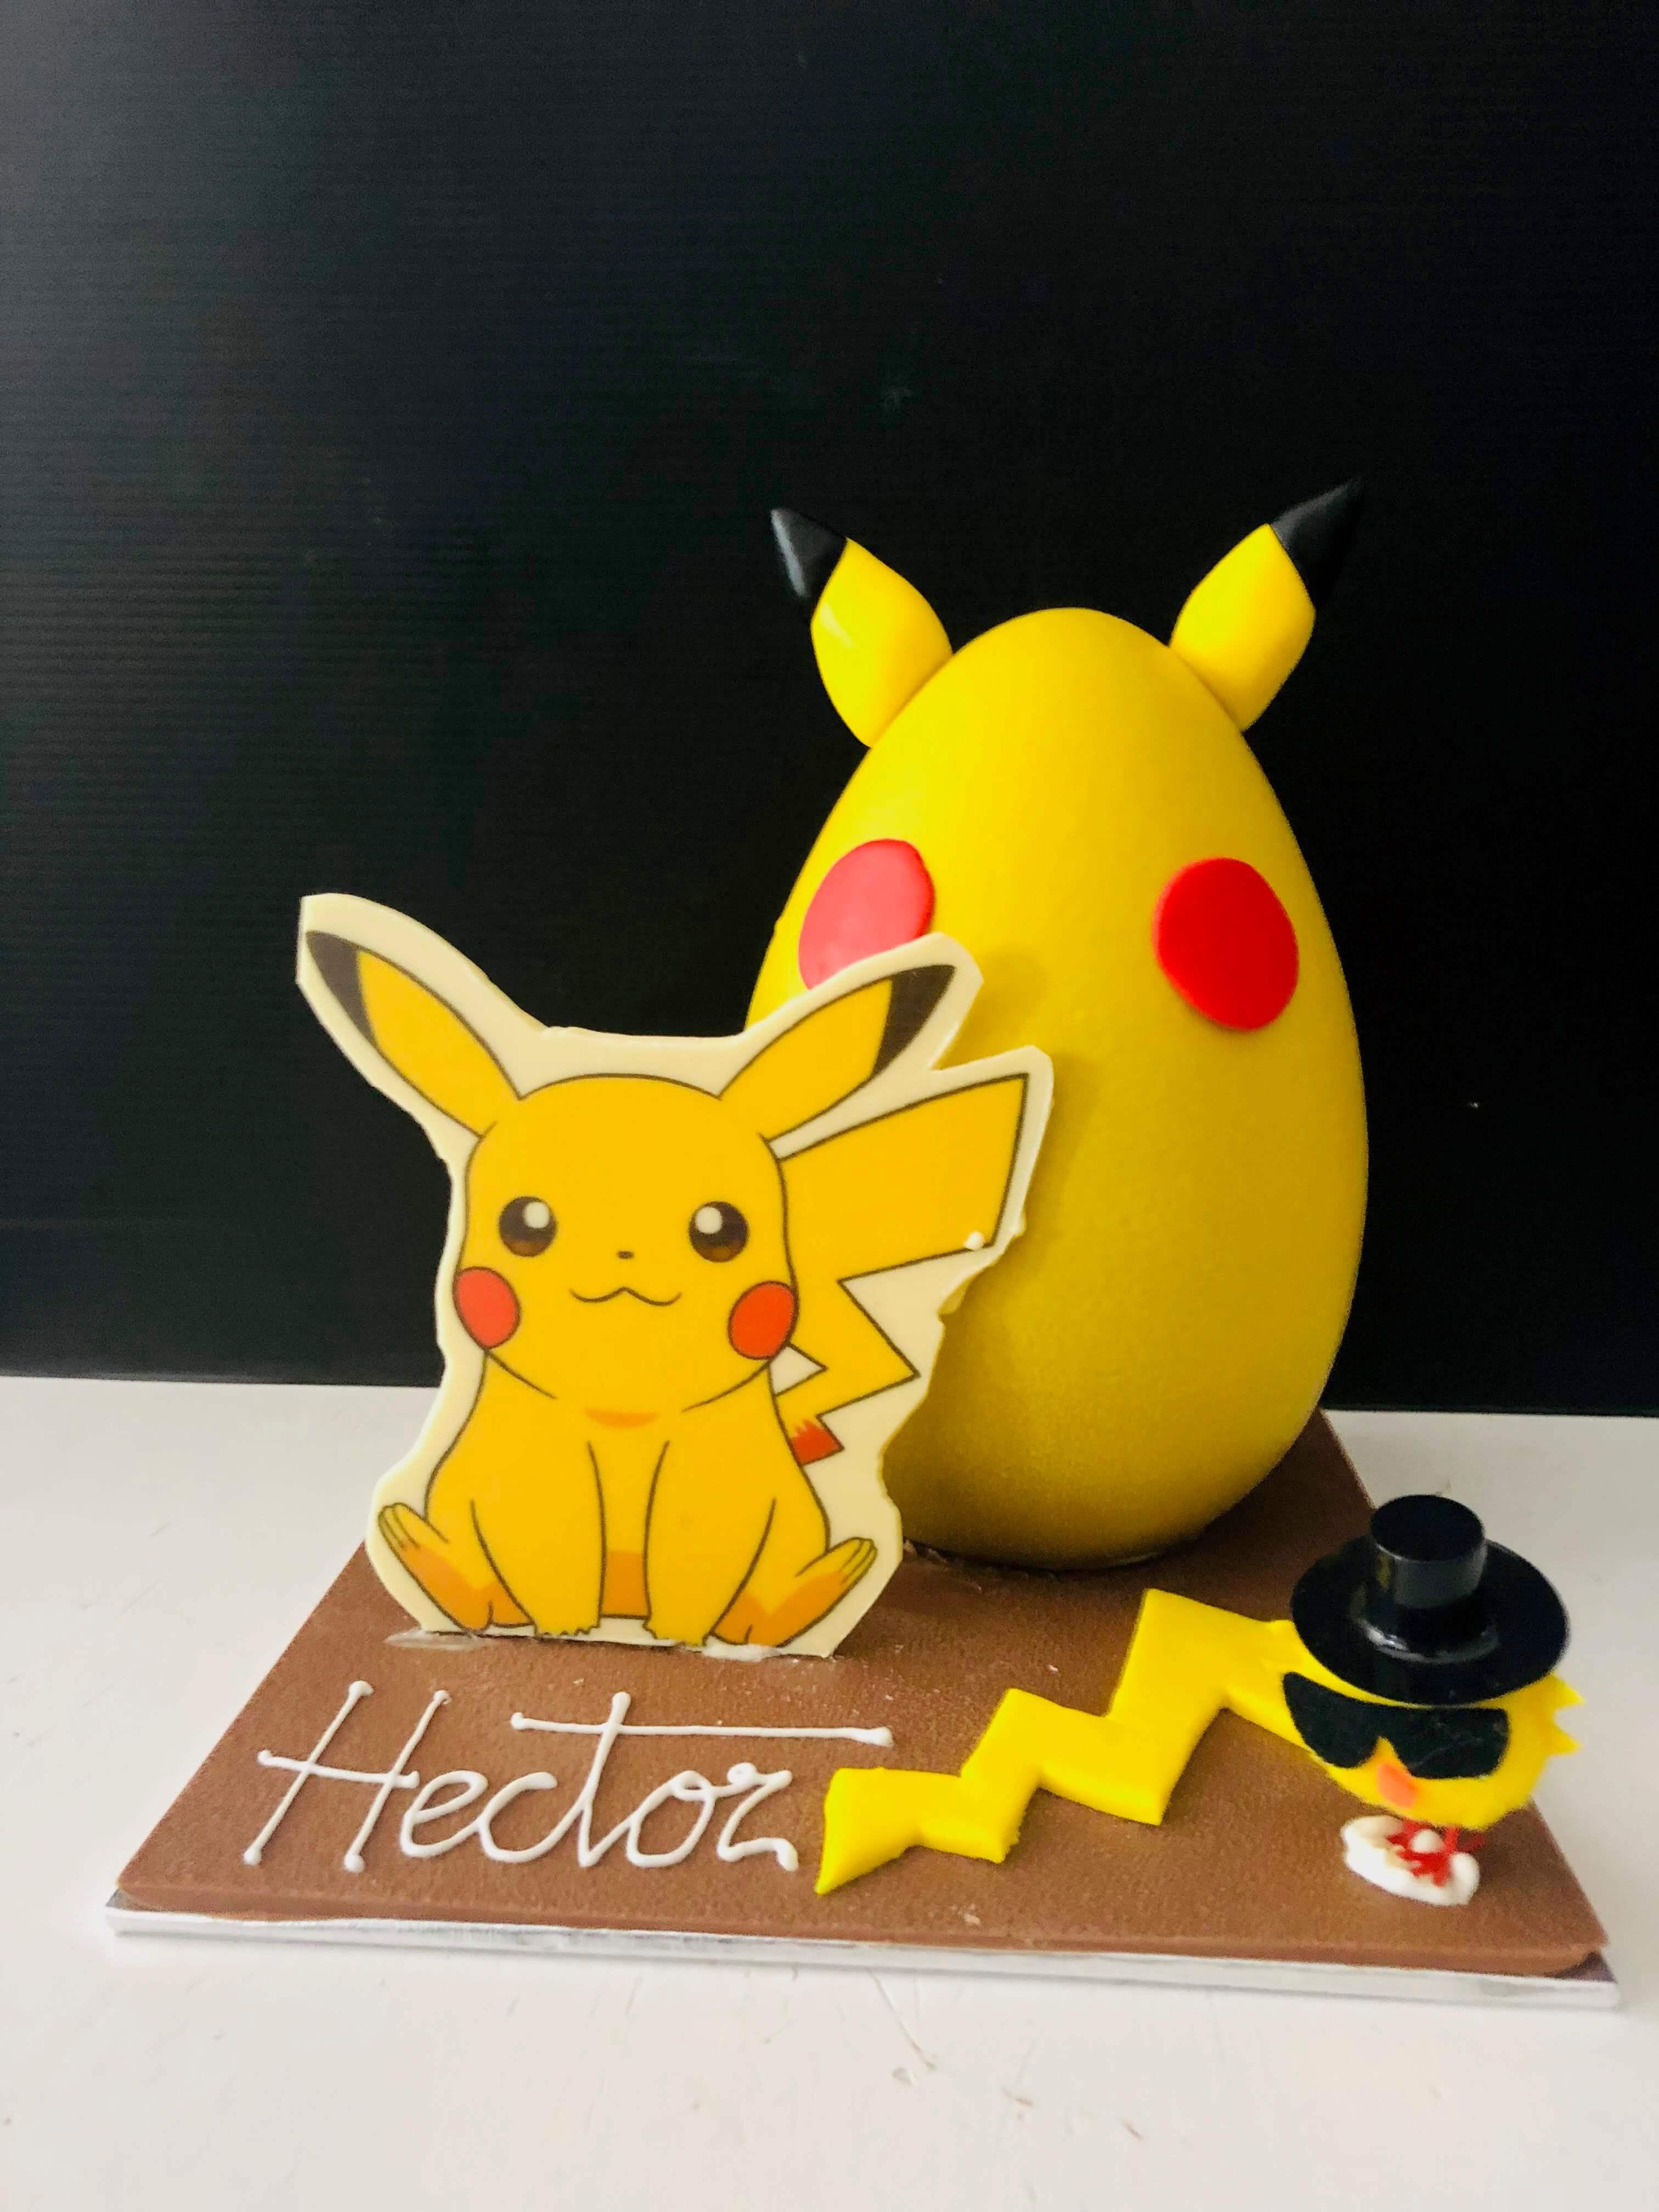 figura de pascua y huevos de pascua chocolate coruña Pikachu pokemon